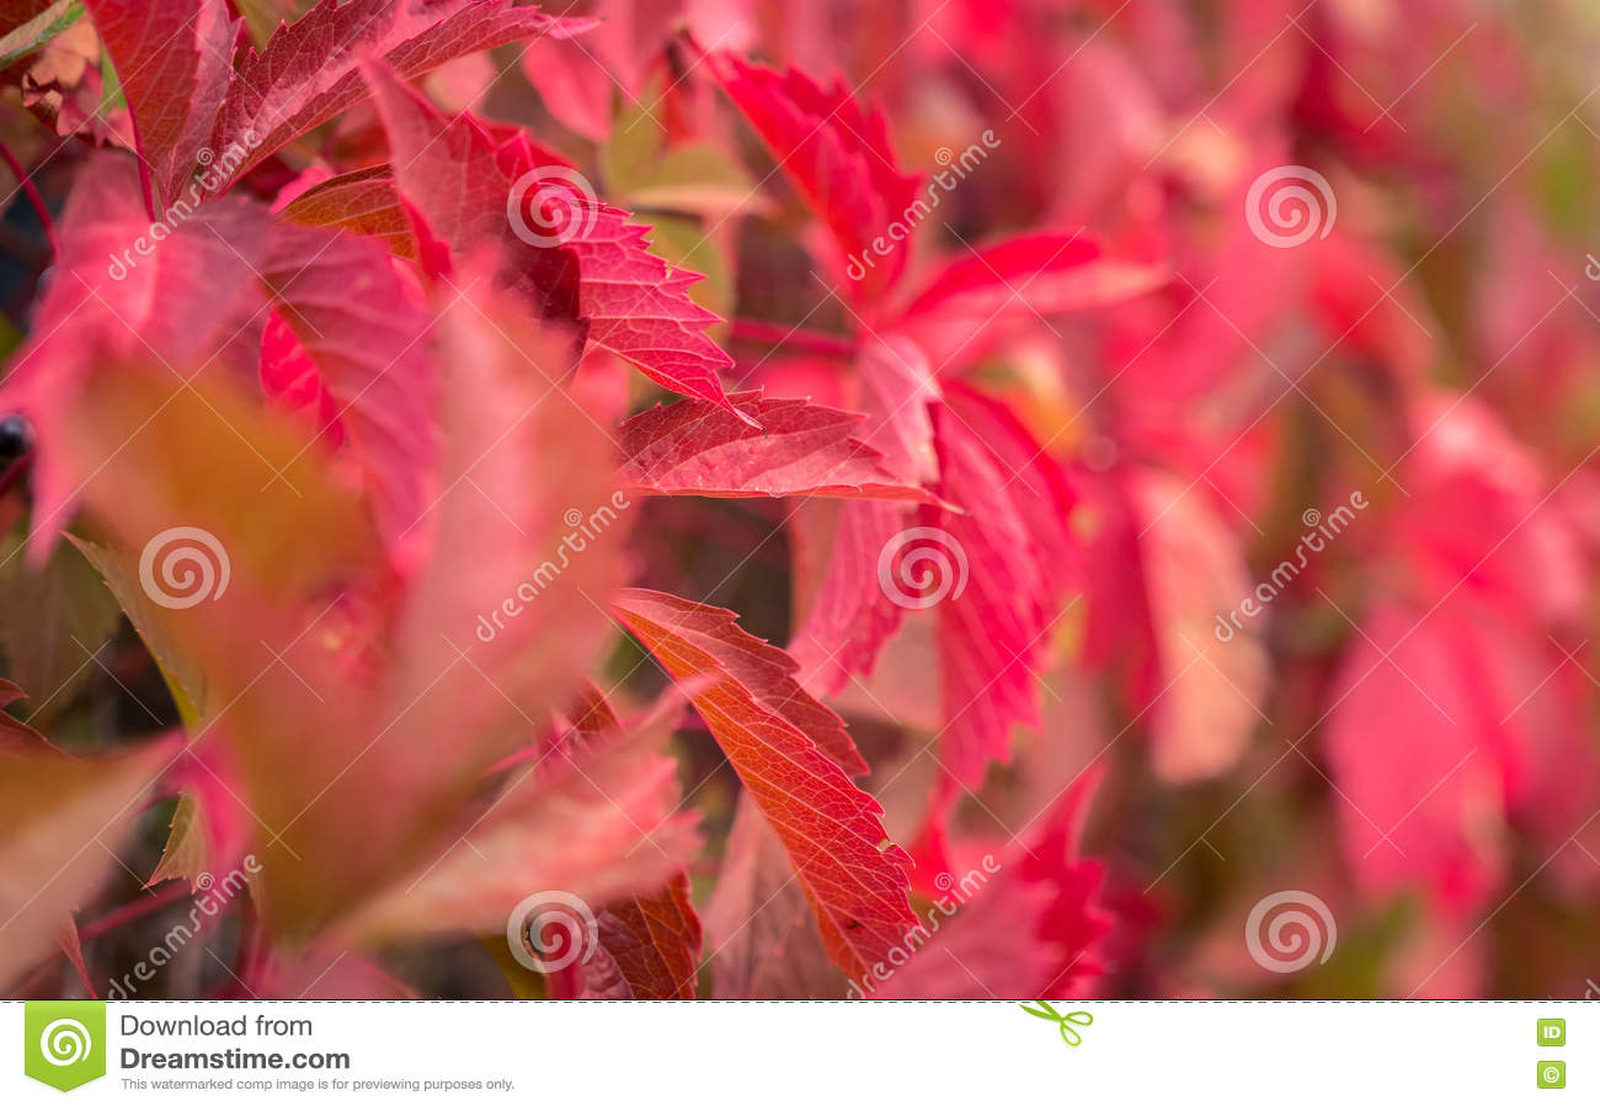 Hojas rojas, hojas de otoño